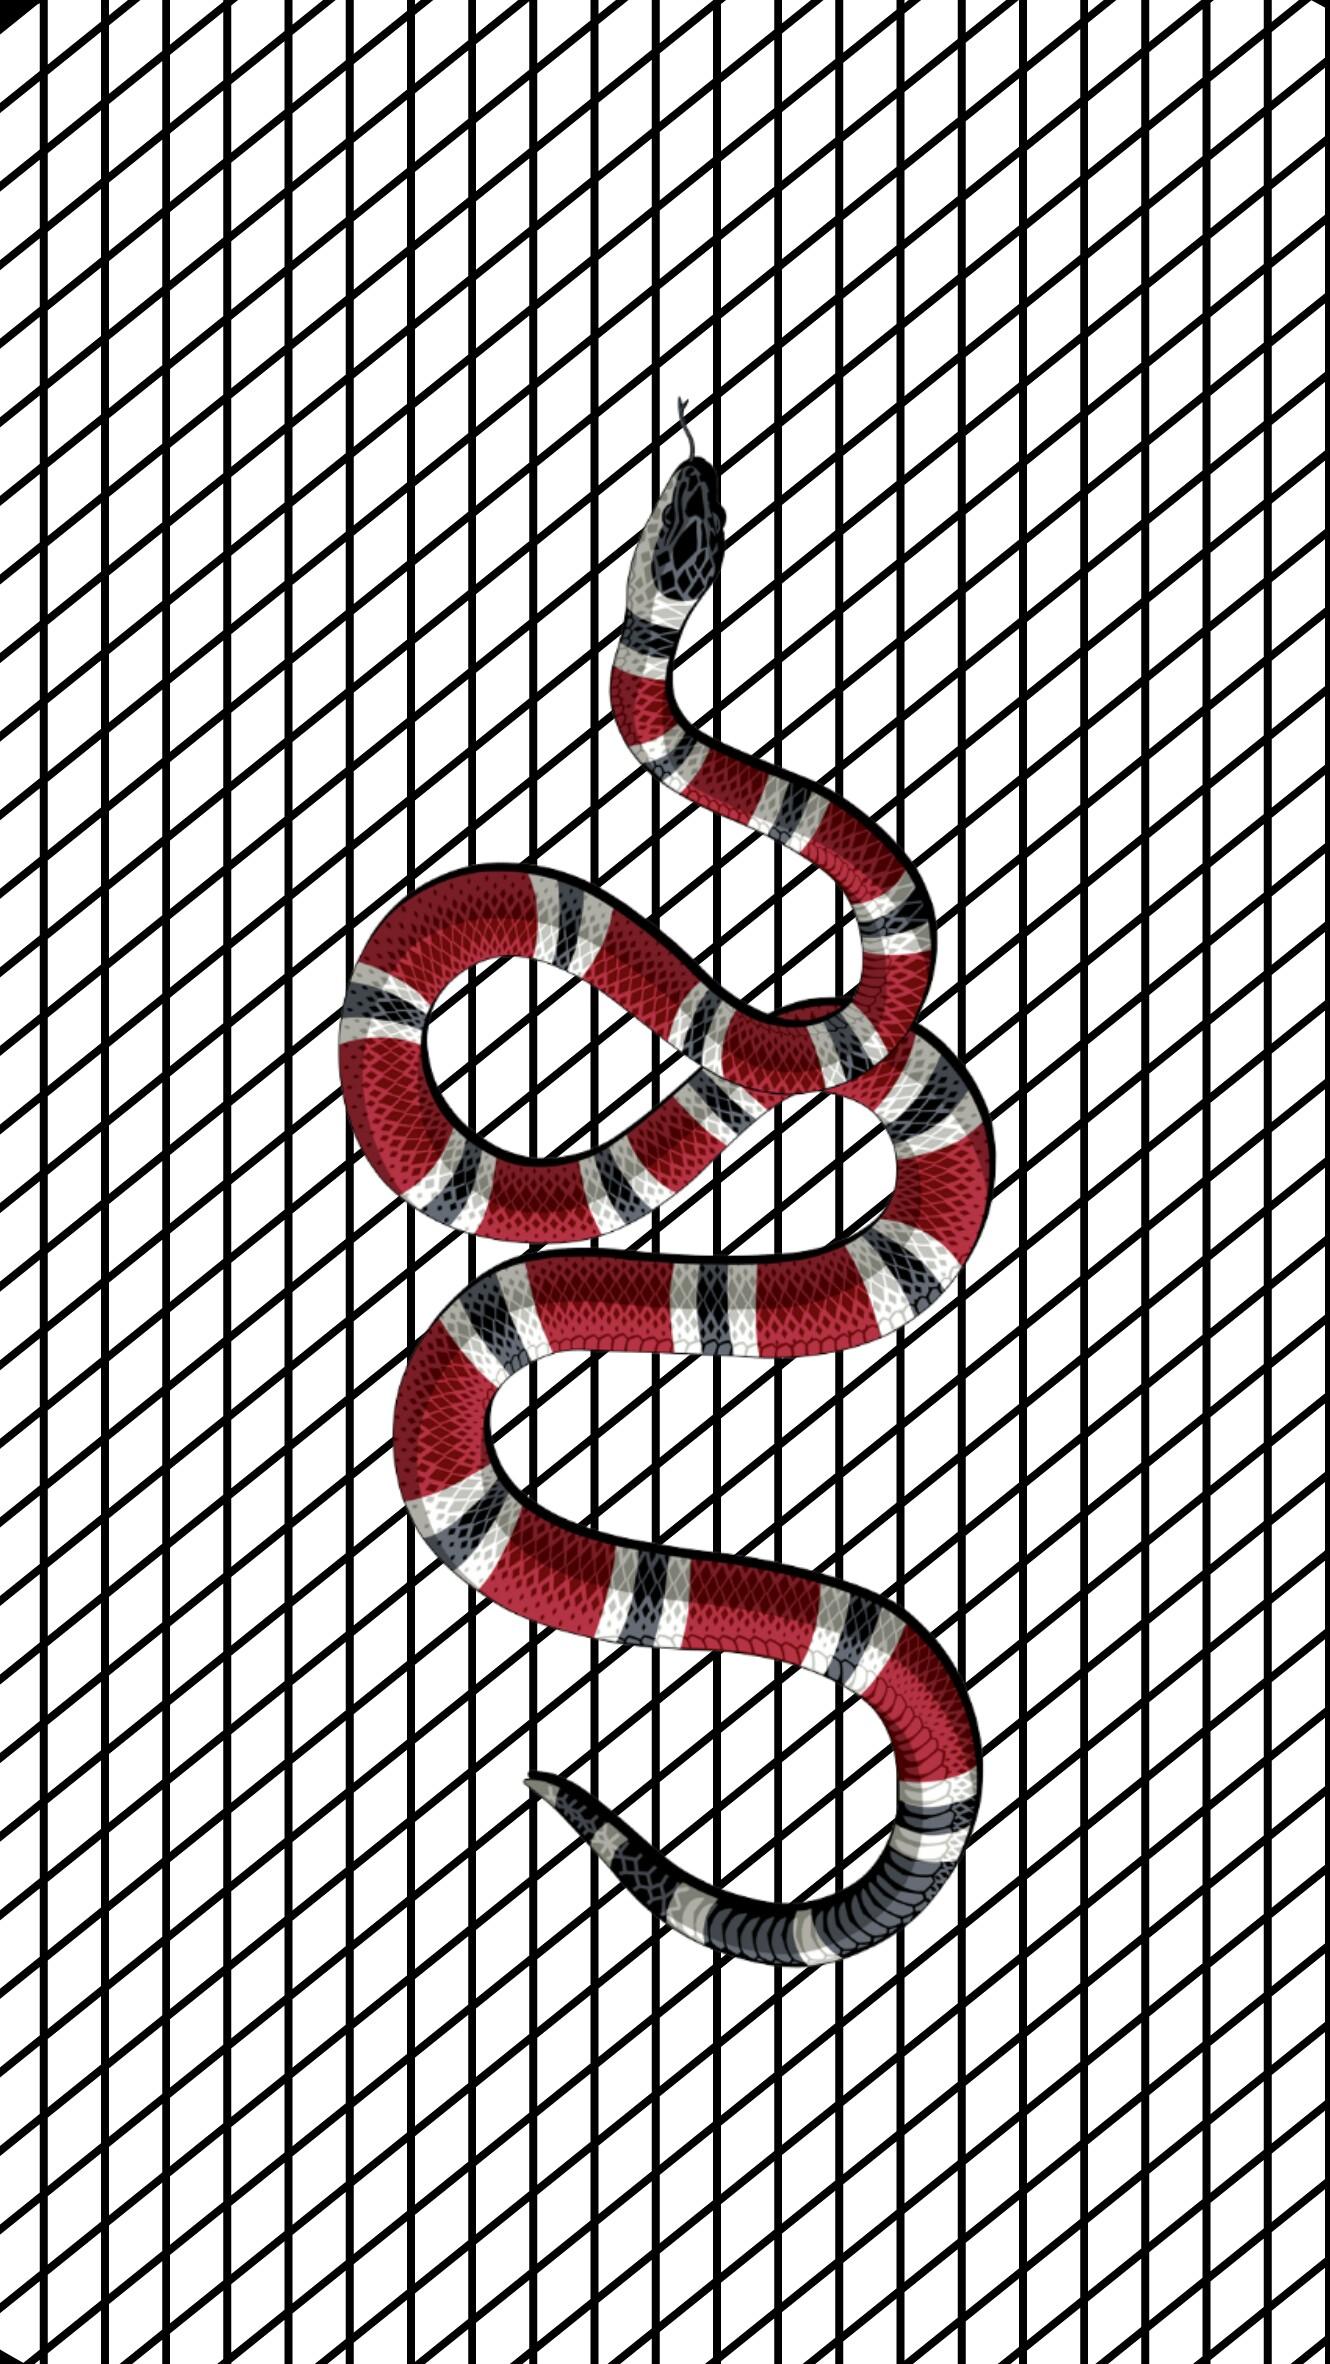 gucci snake wallpaper back background birthday blackan